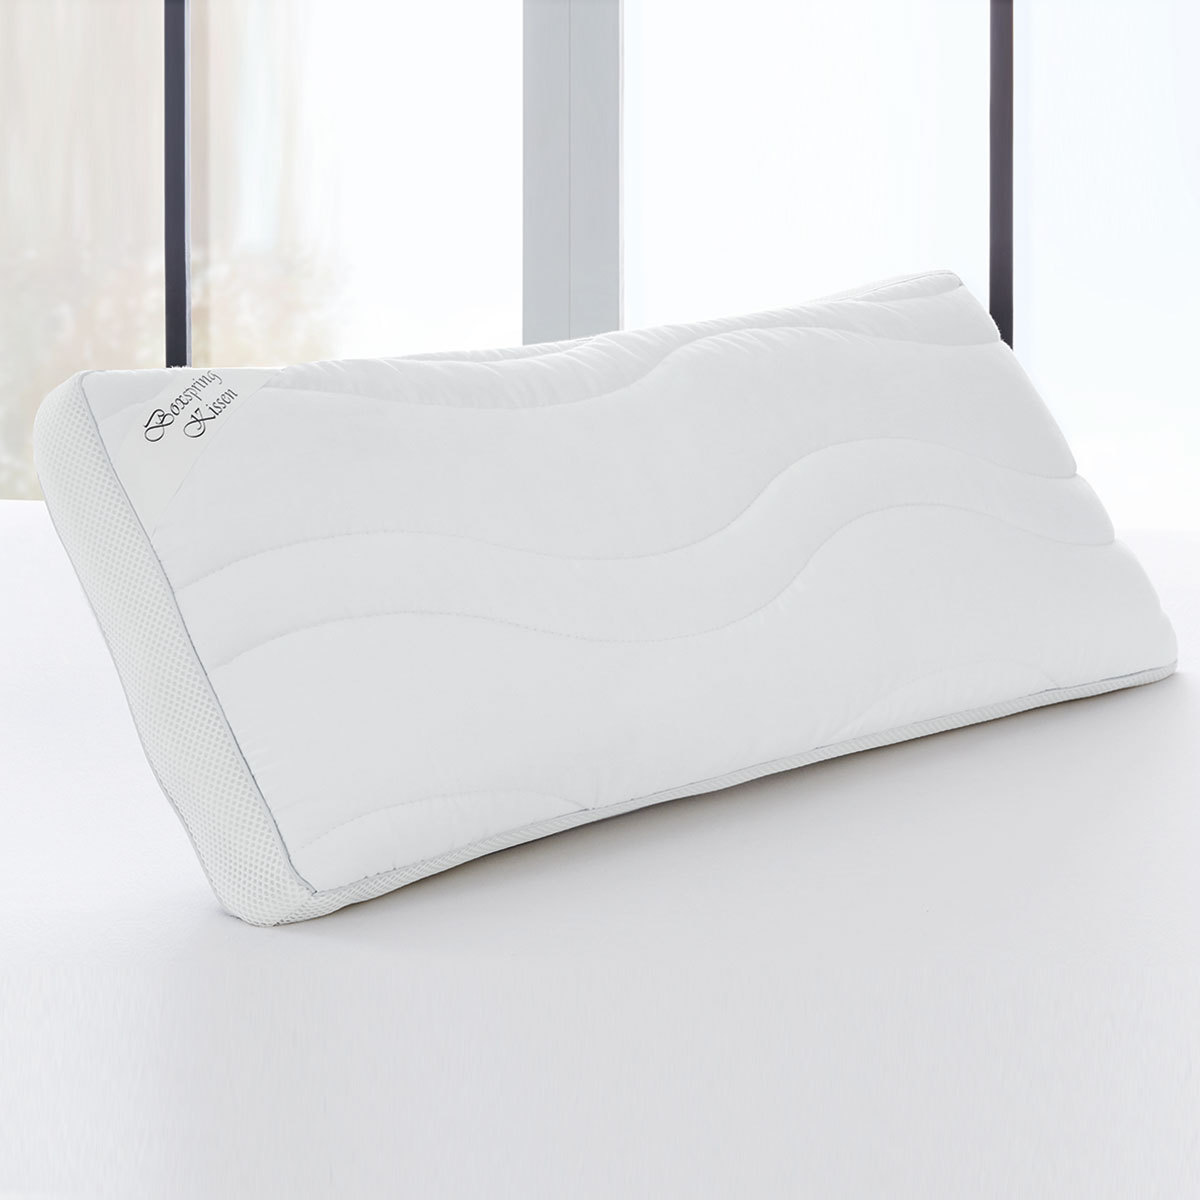 Dormisette Boxspring Kissen Premium